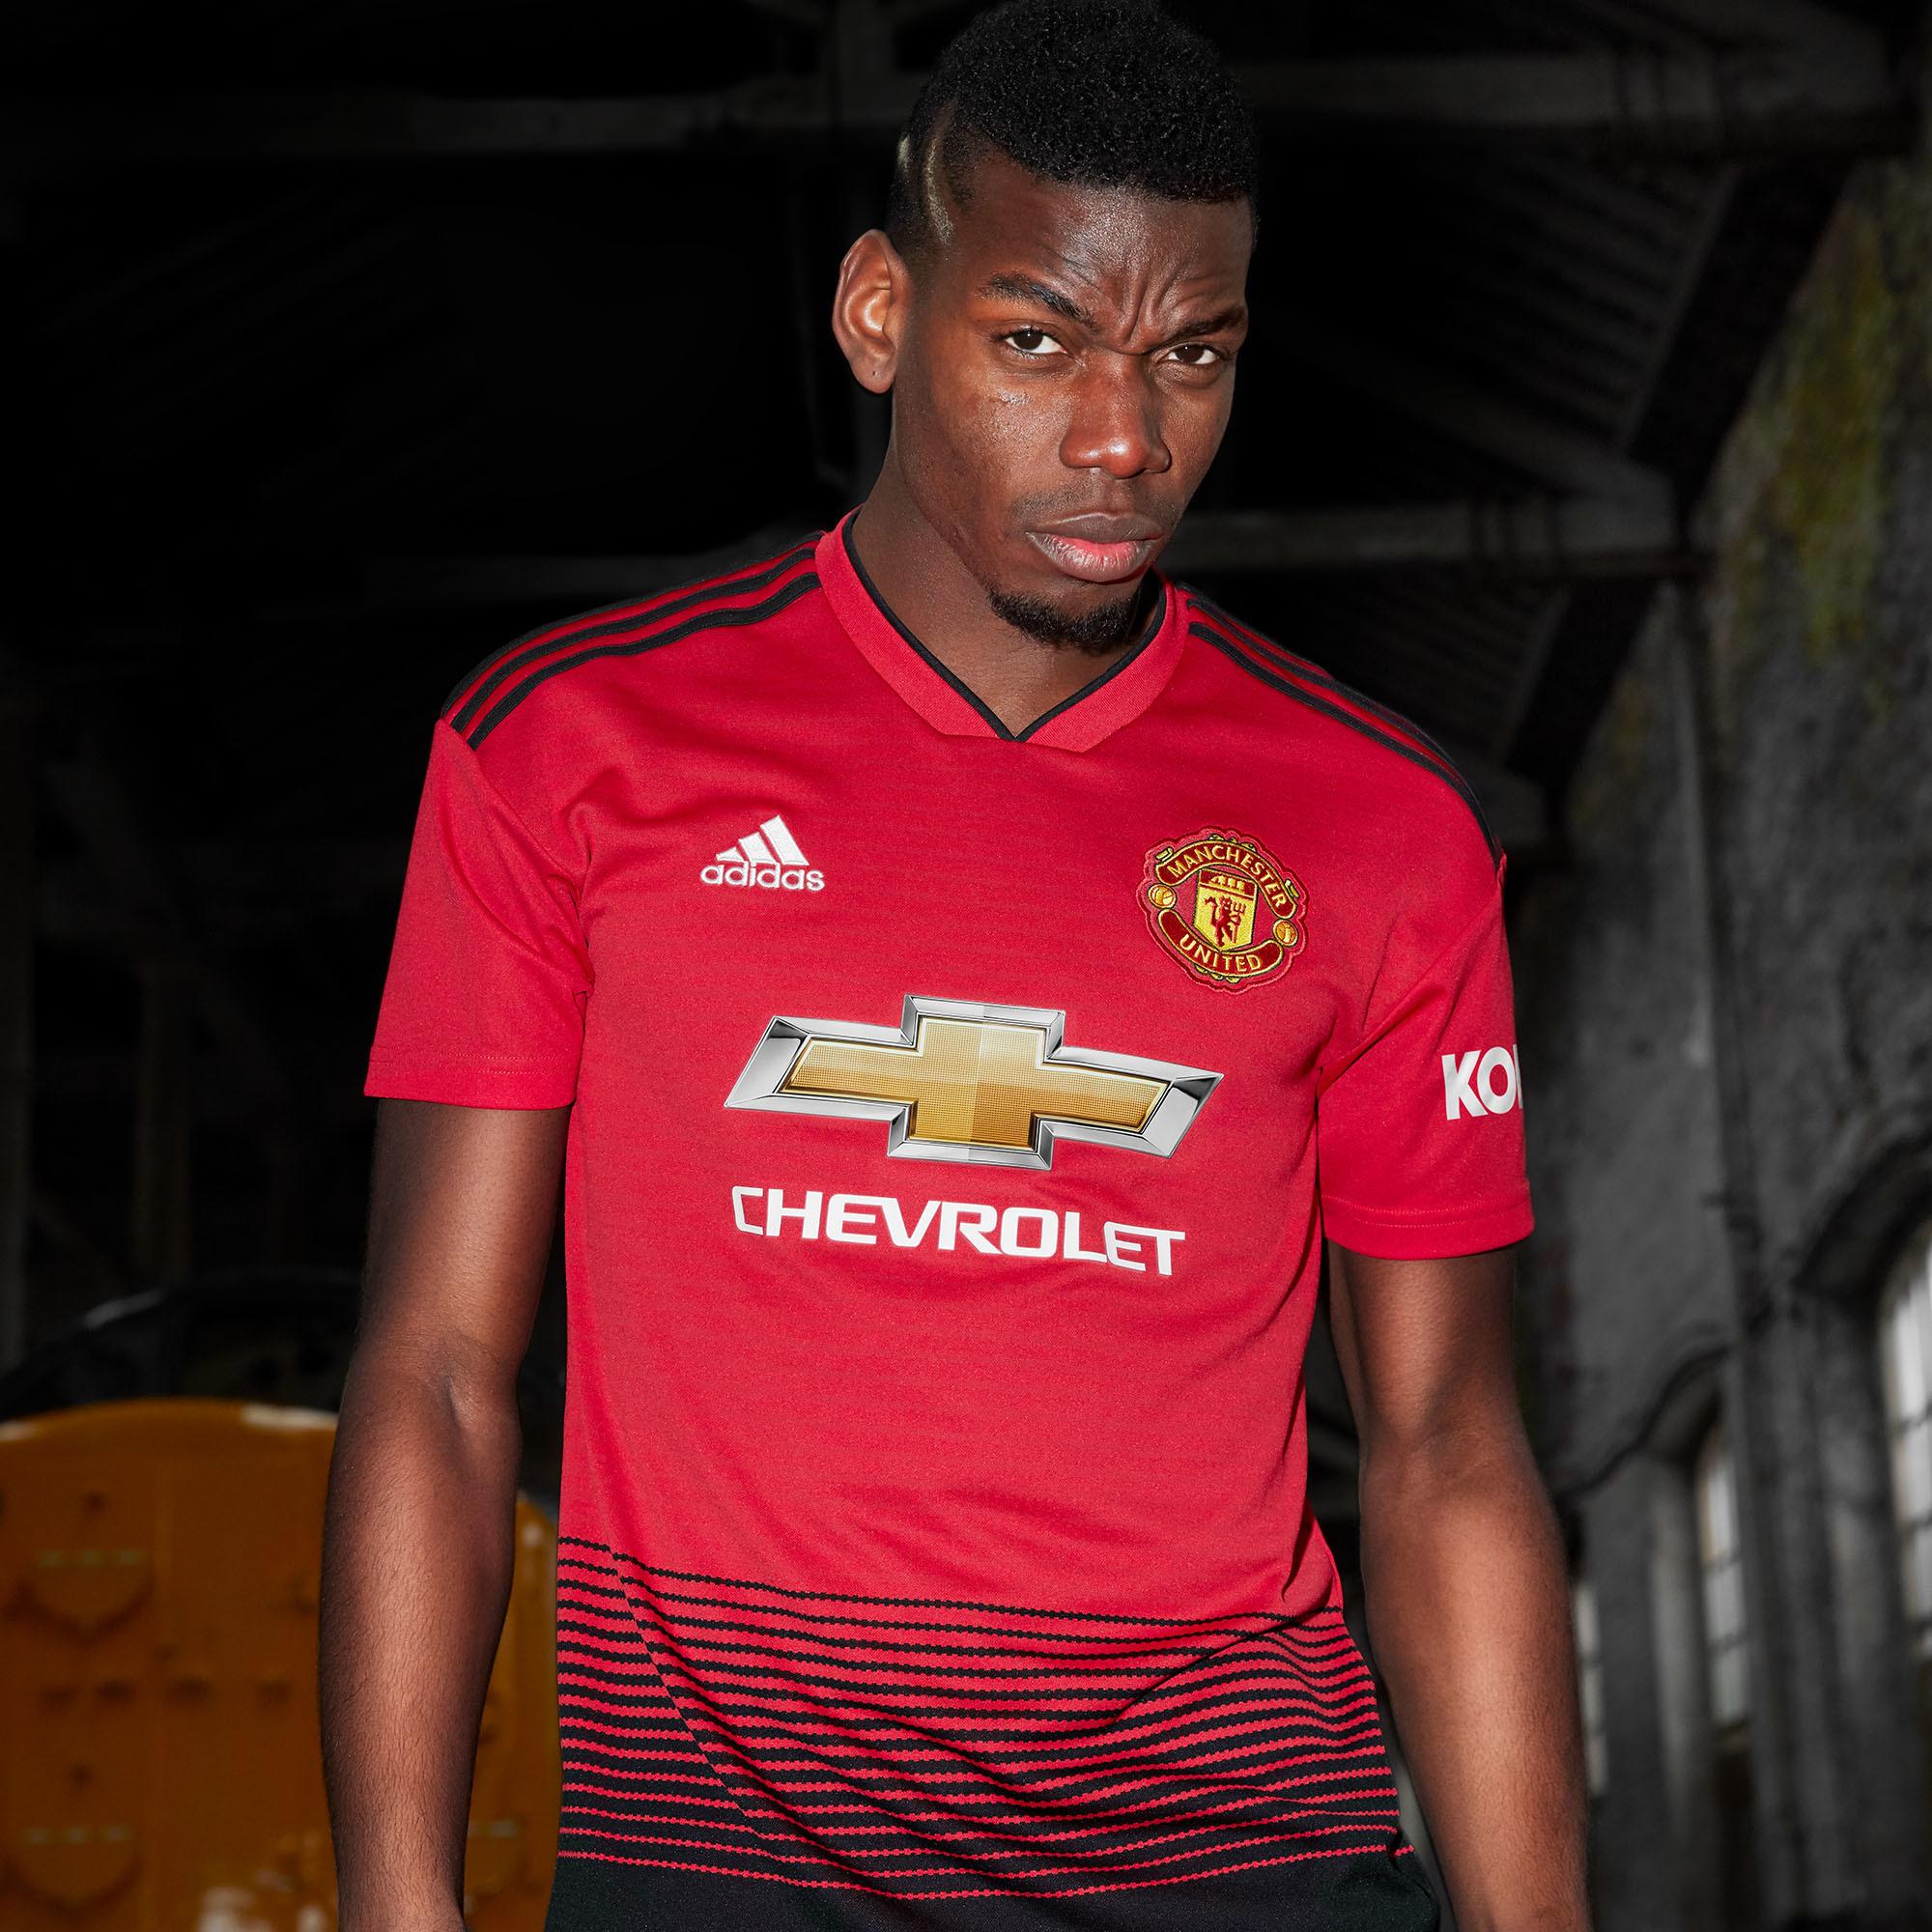 dd88fa6472 Pogba apresenta nova camisa do Manchester United